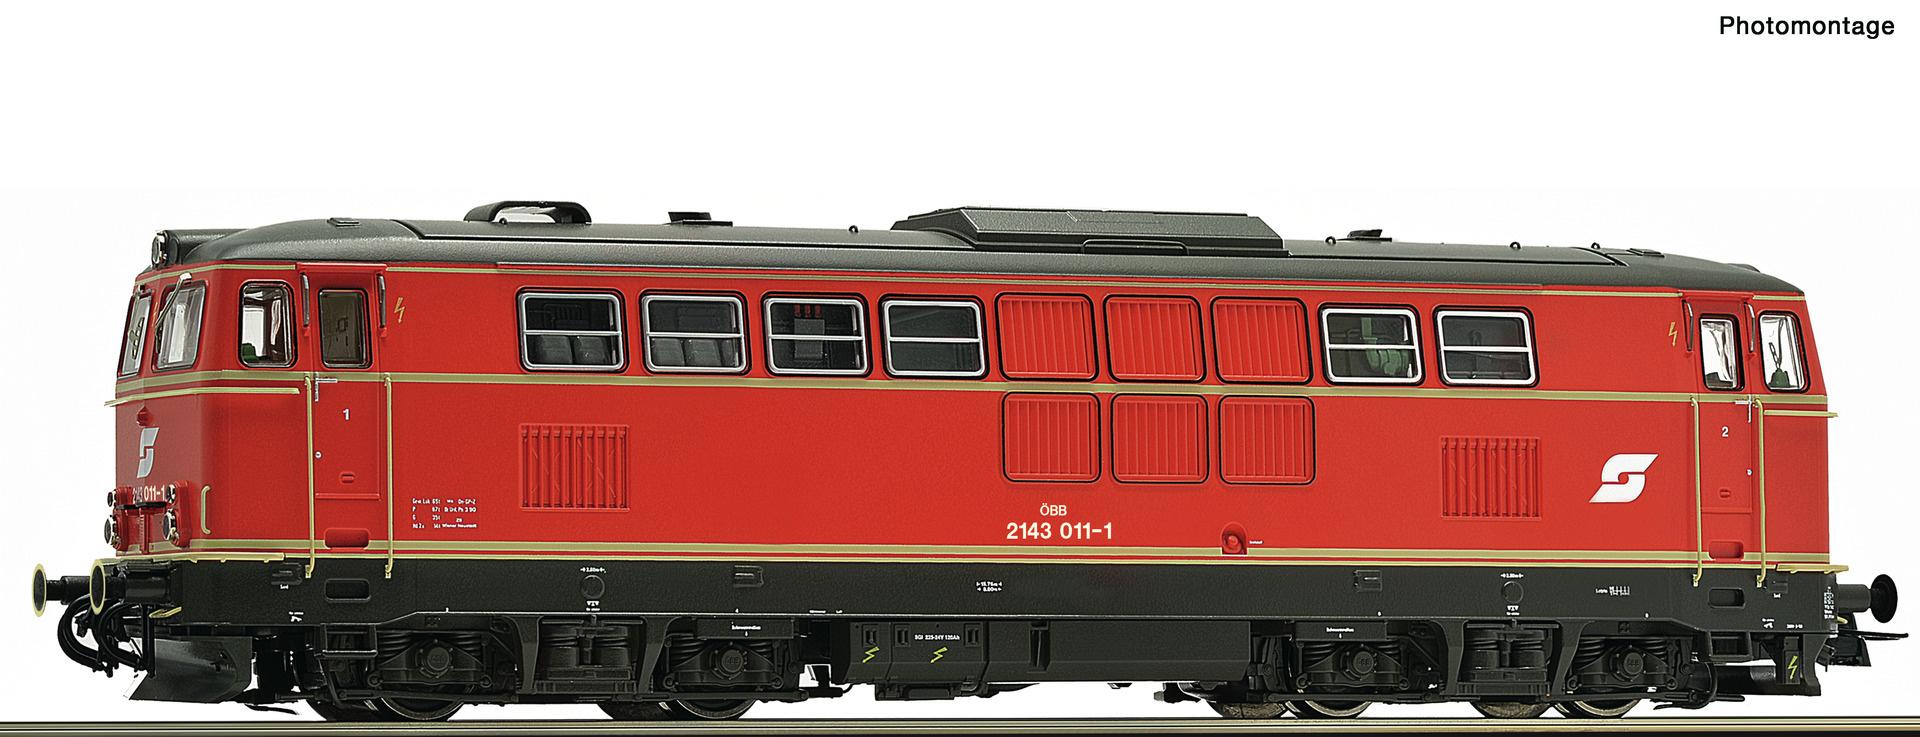 70713 Diesellok Rh 2143 ÖBB-1